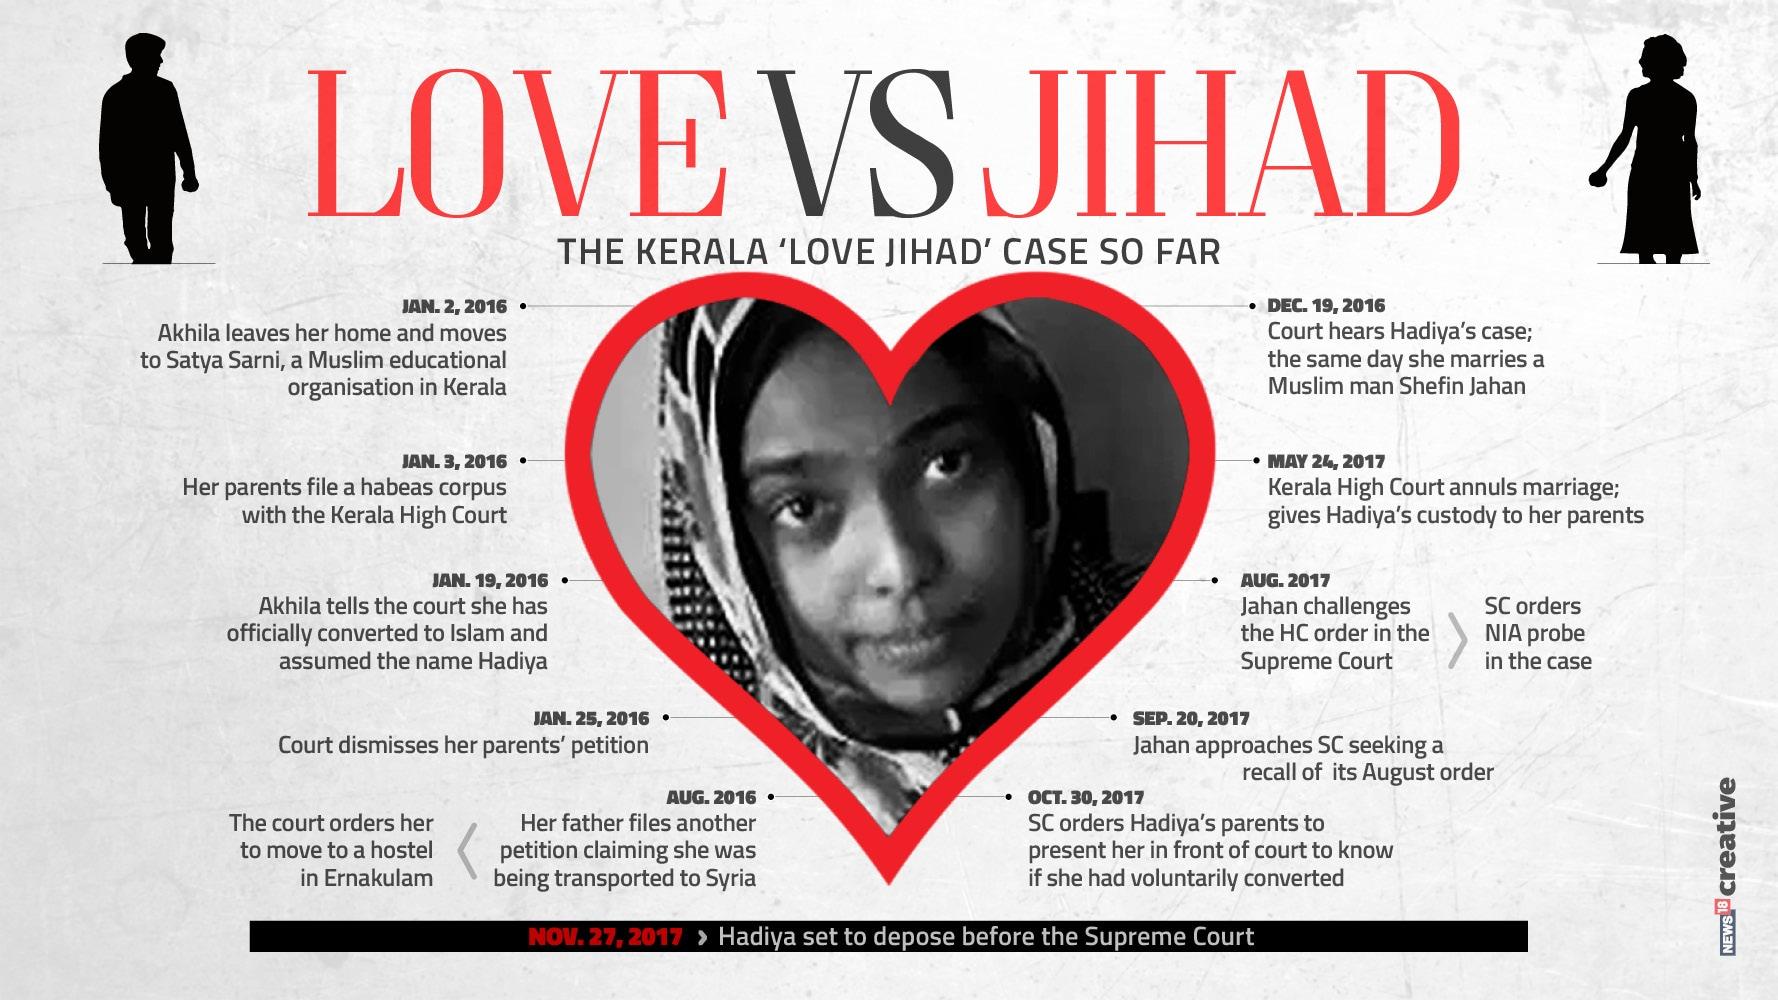 LOVE_JIHAD (2) (1)